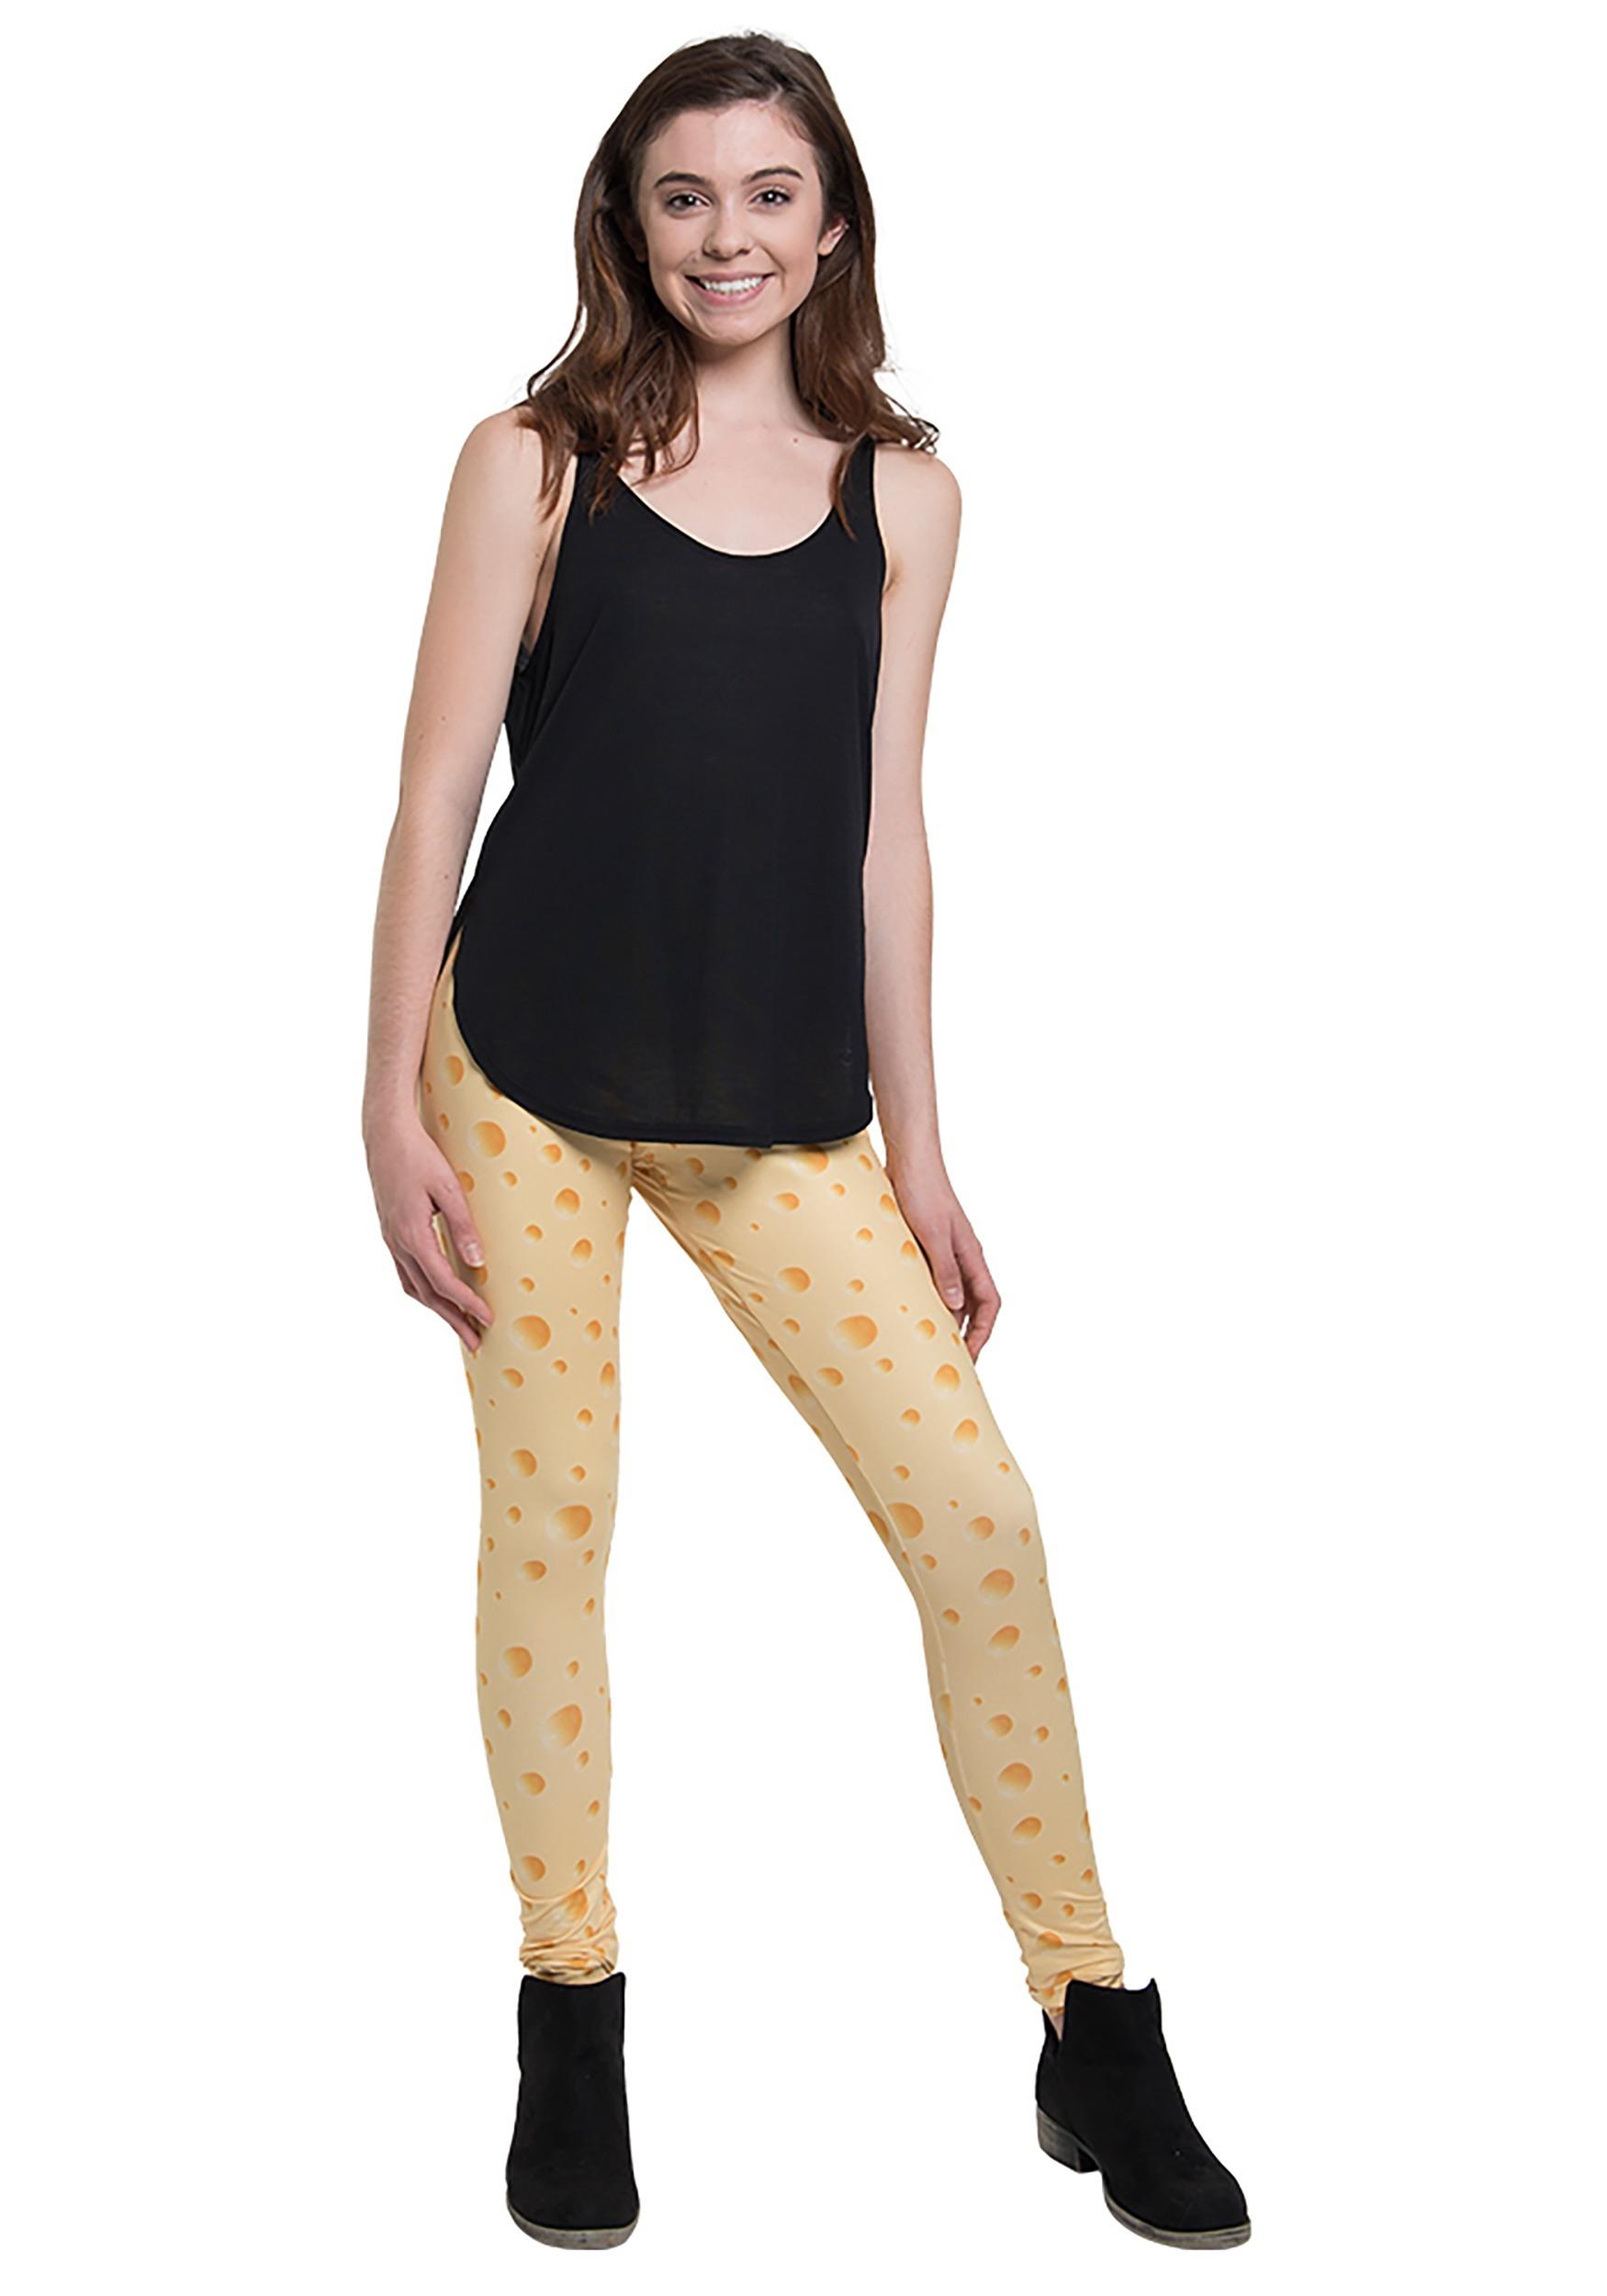 Womens Cheese Print Leggings